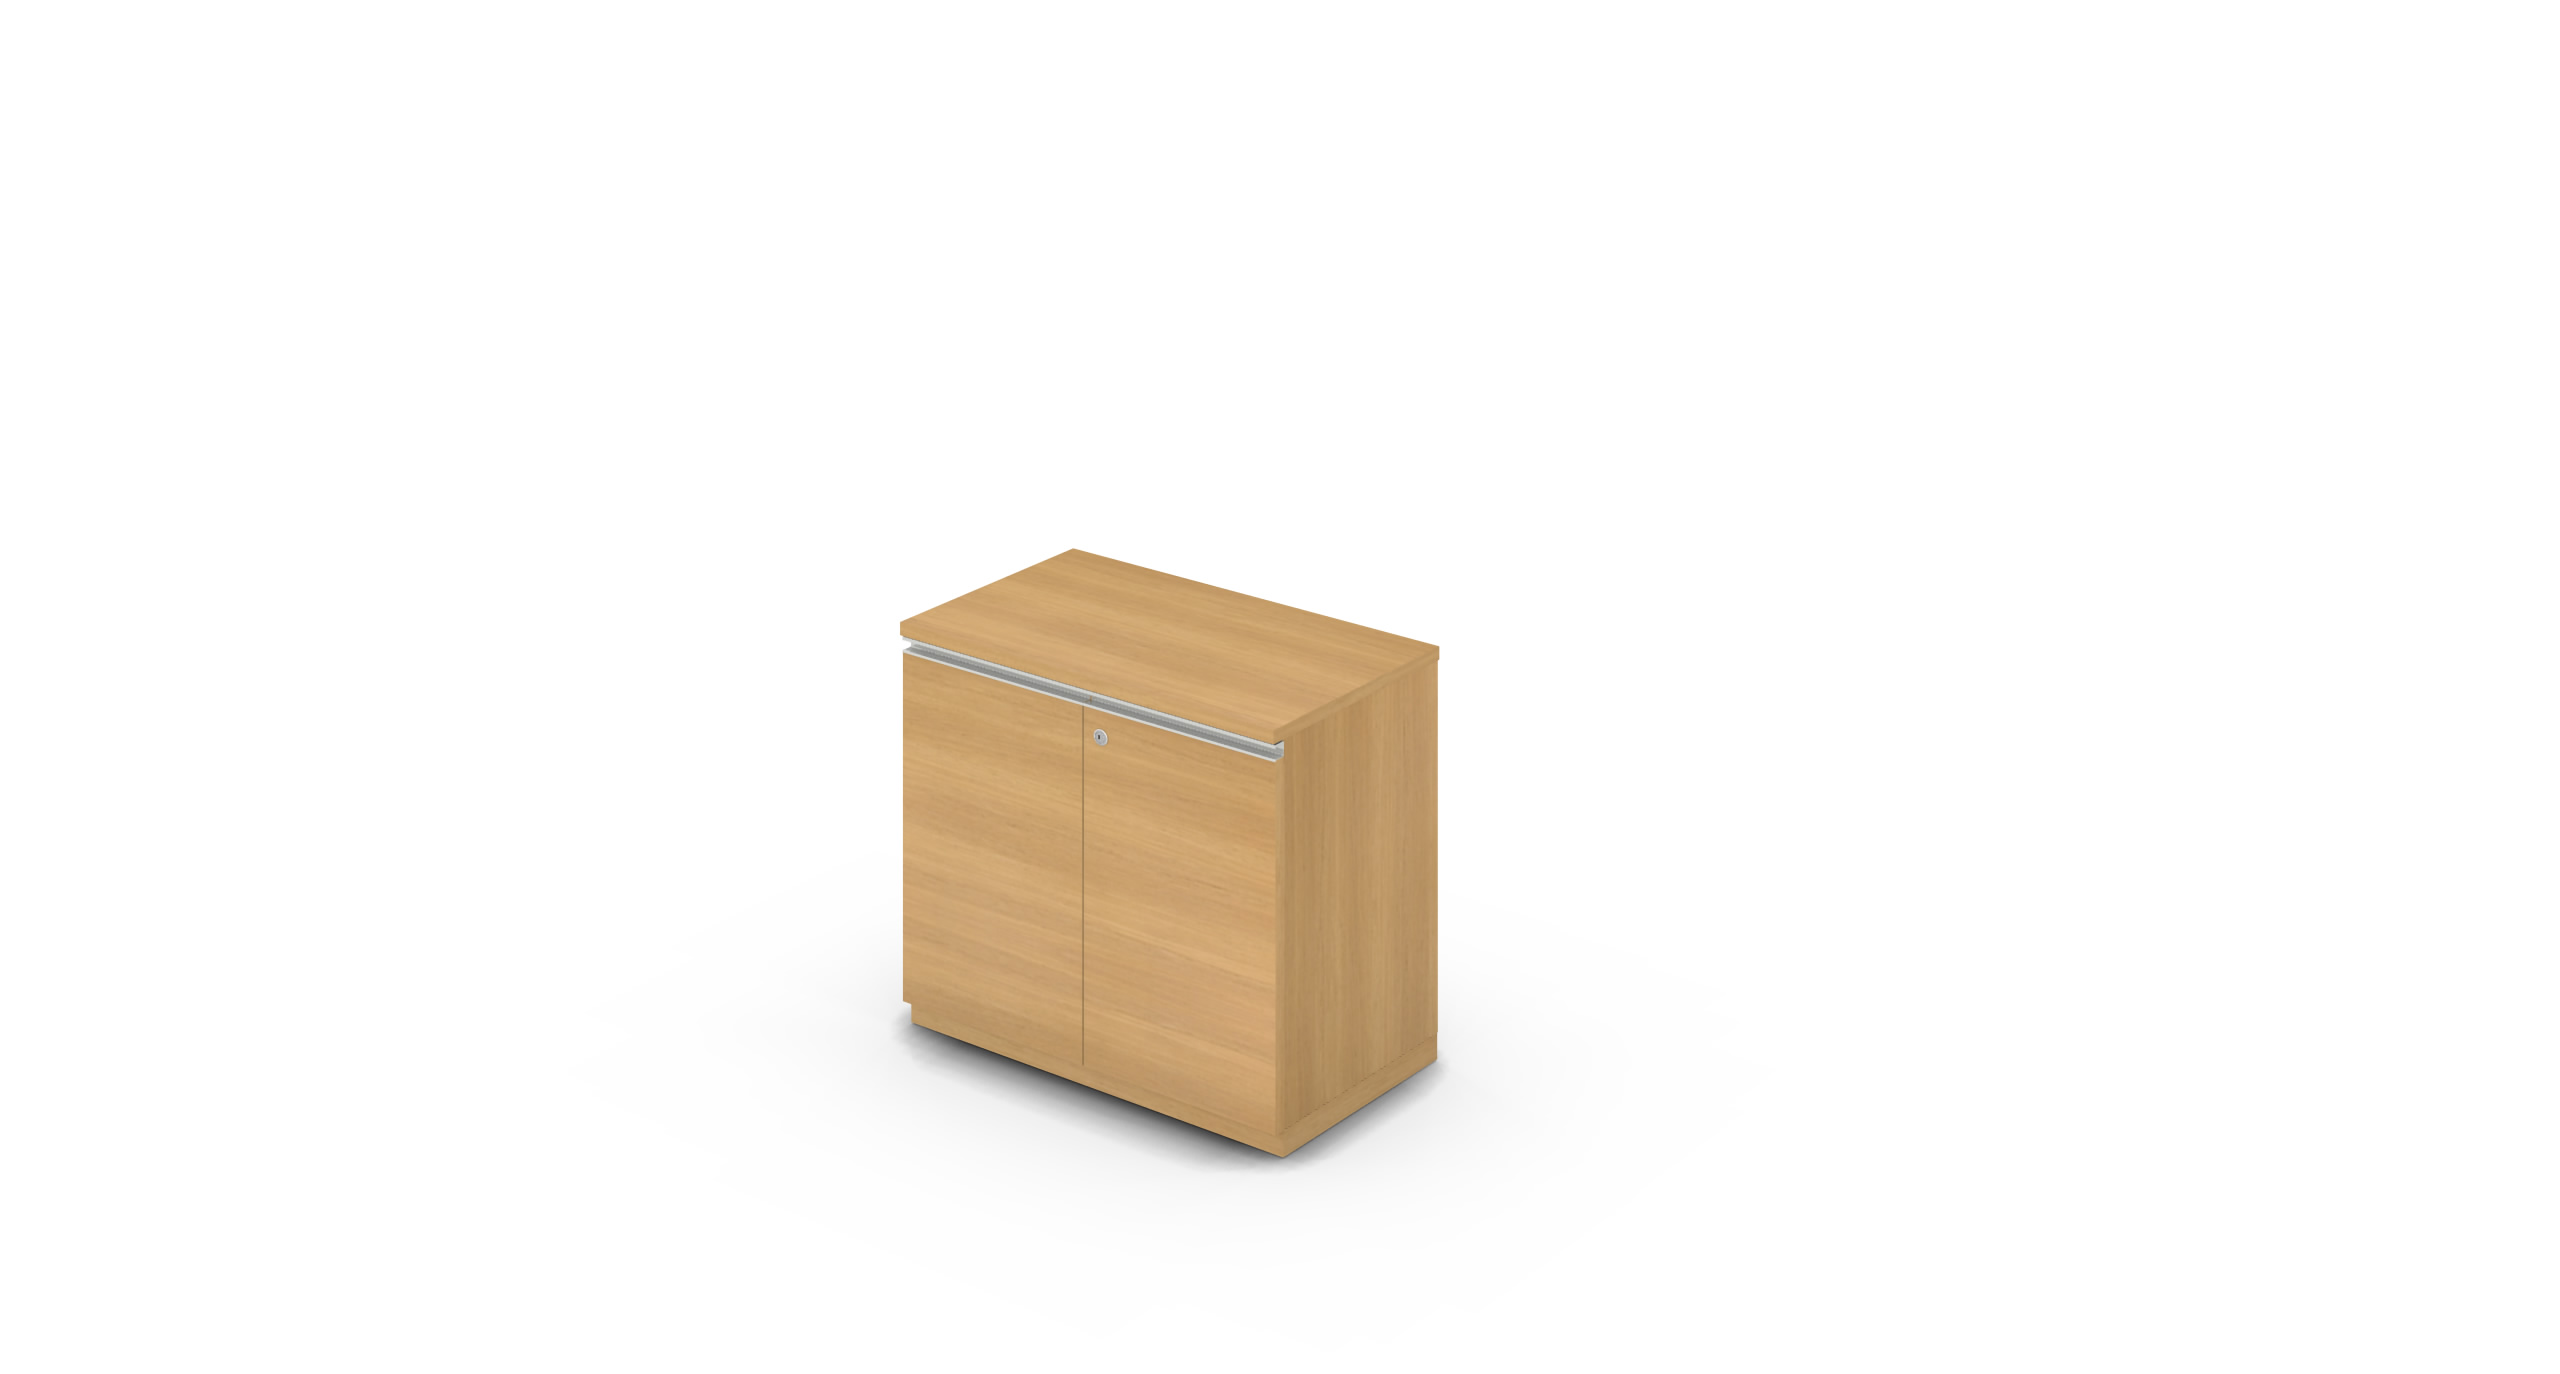 Cabinet_800x450x775_HD_Oak_Rail_WithCylinder